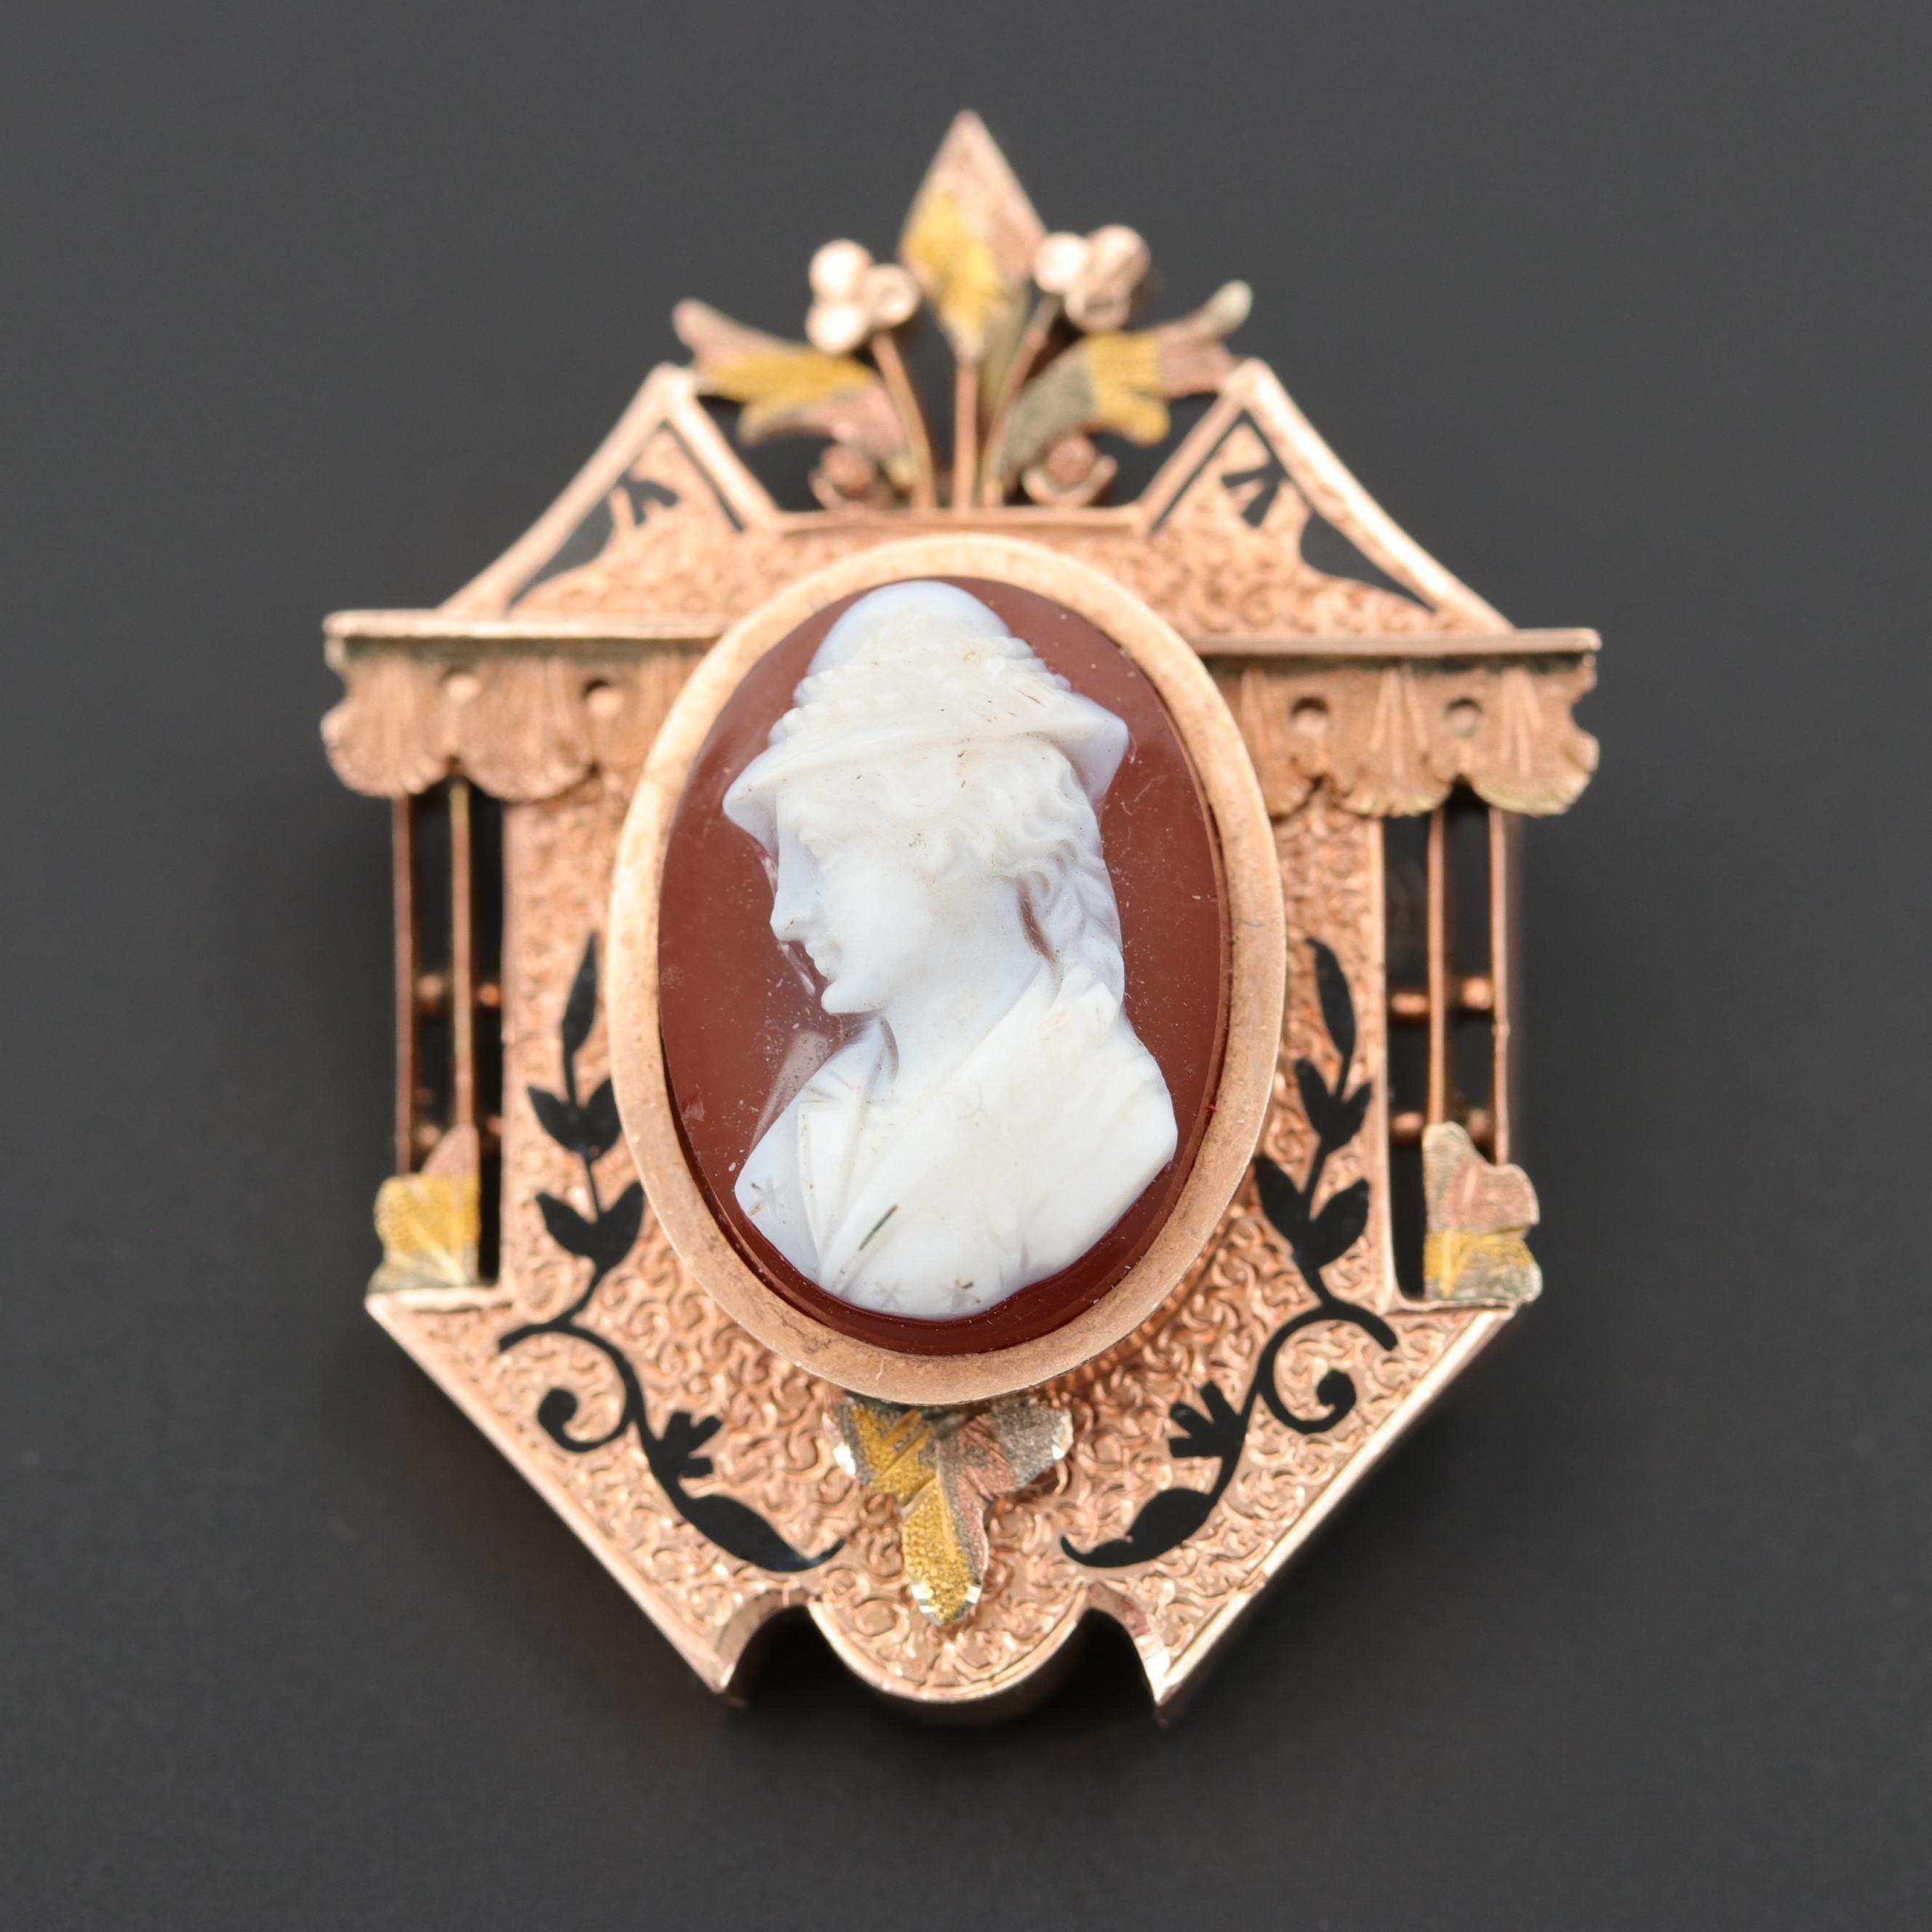 Victorian 14K Rose Gold Carved Sardonyx Cameo Converter Brooch